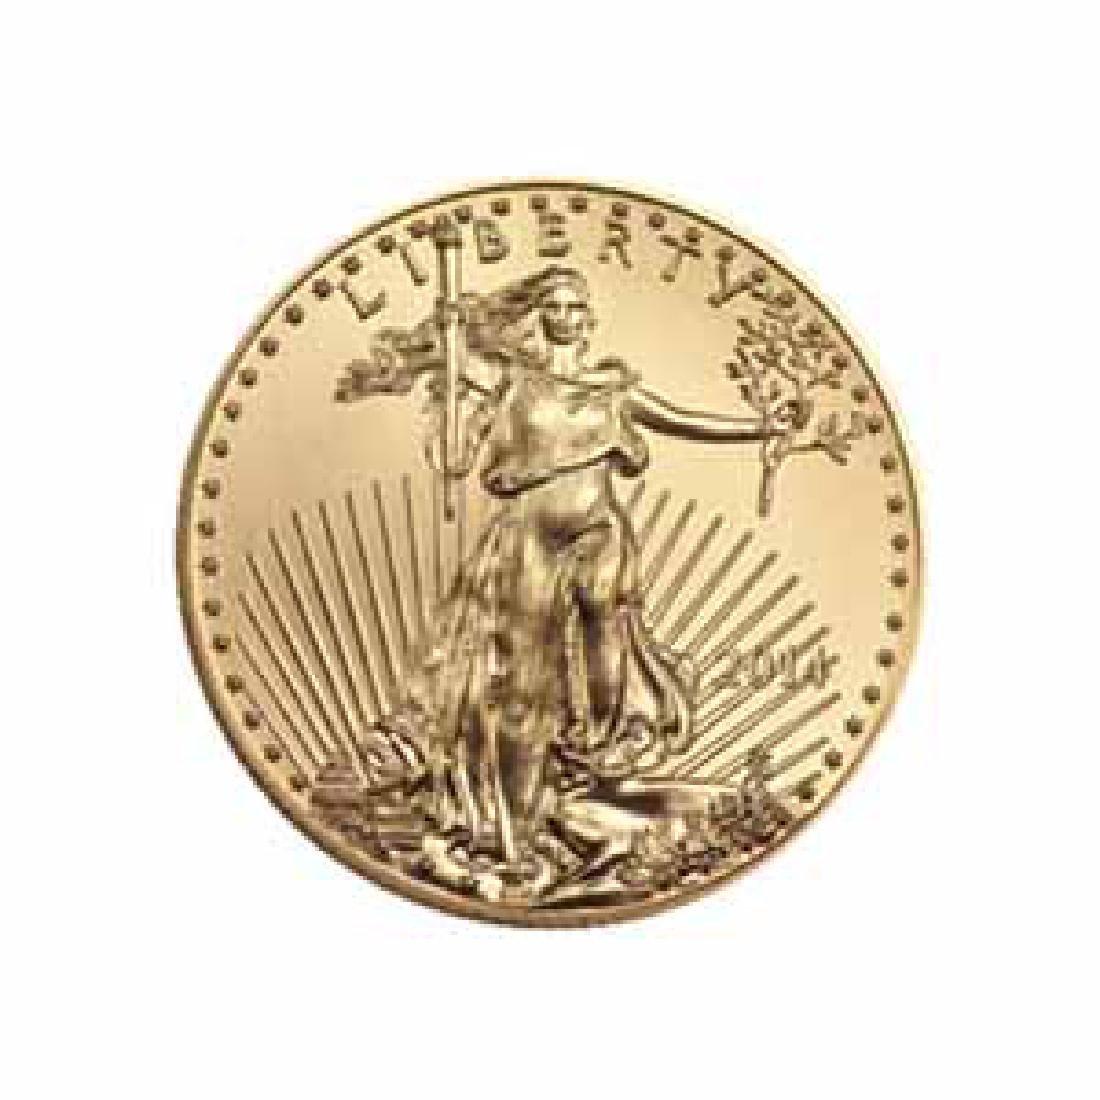 2014 American Gold Eagle 1/2 oz Uncirculated